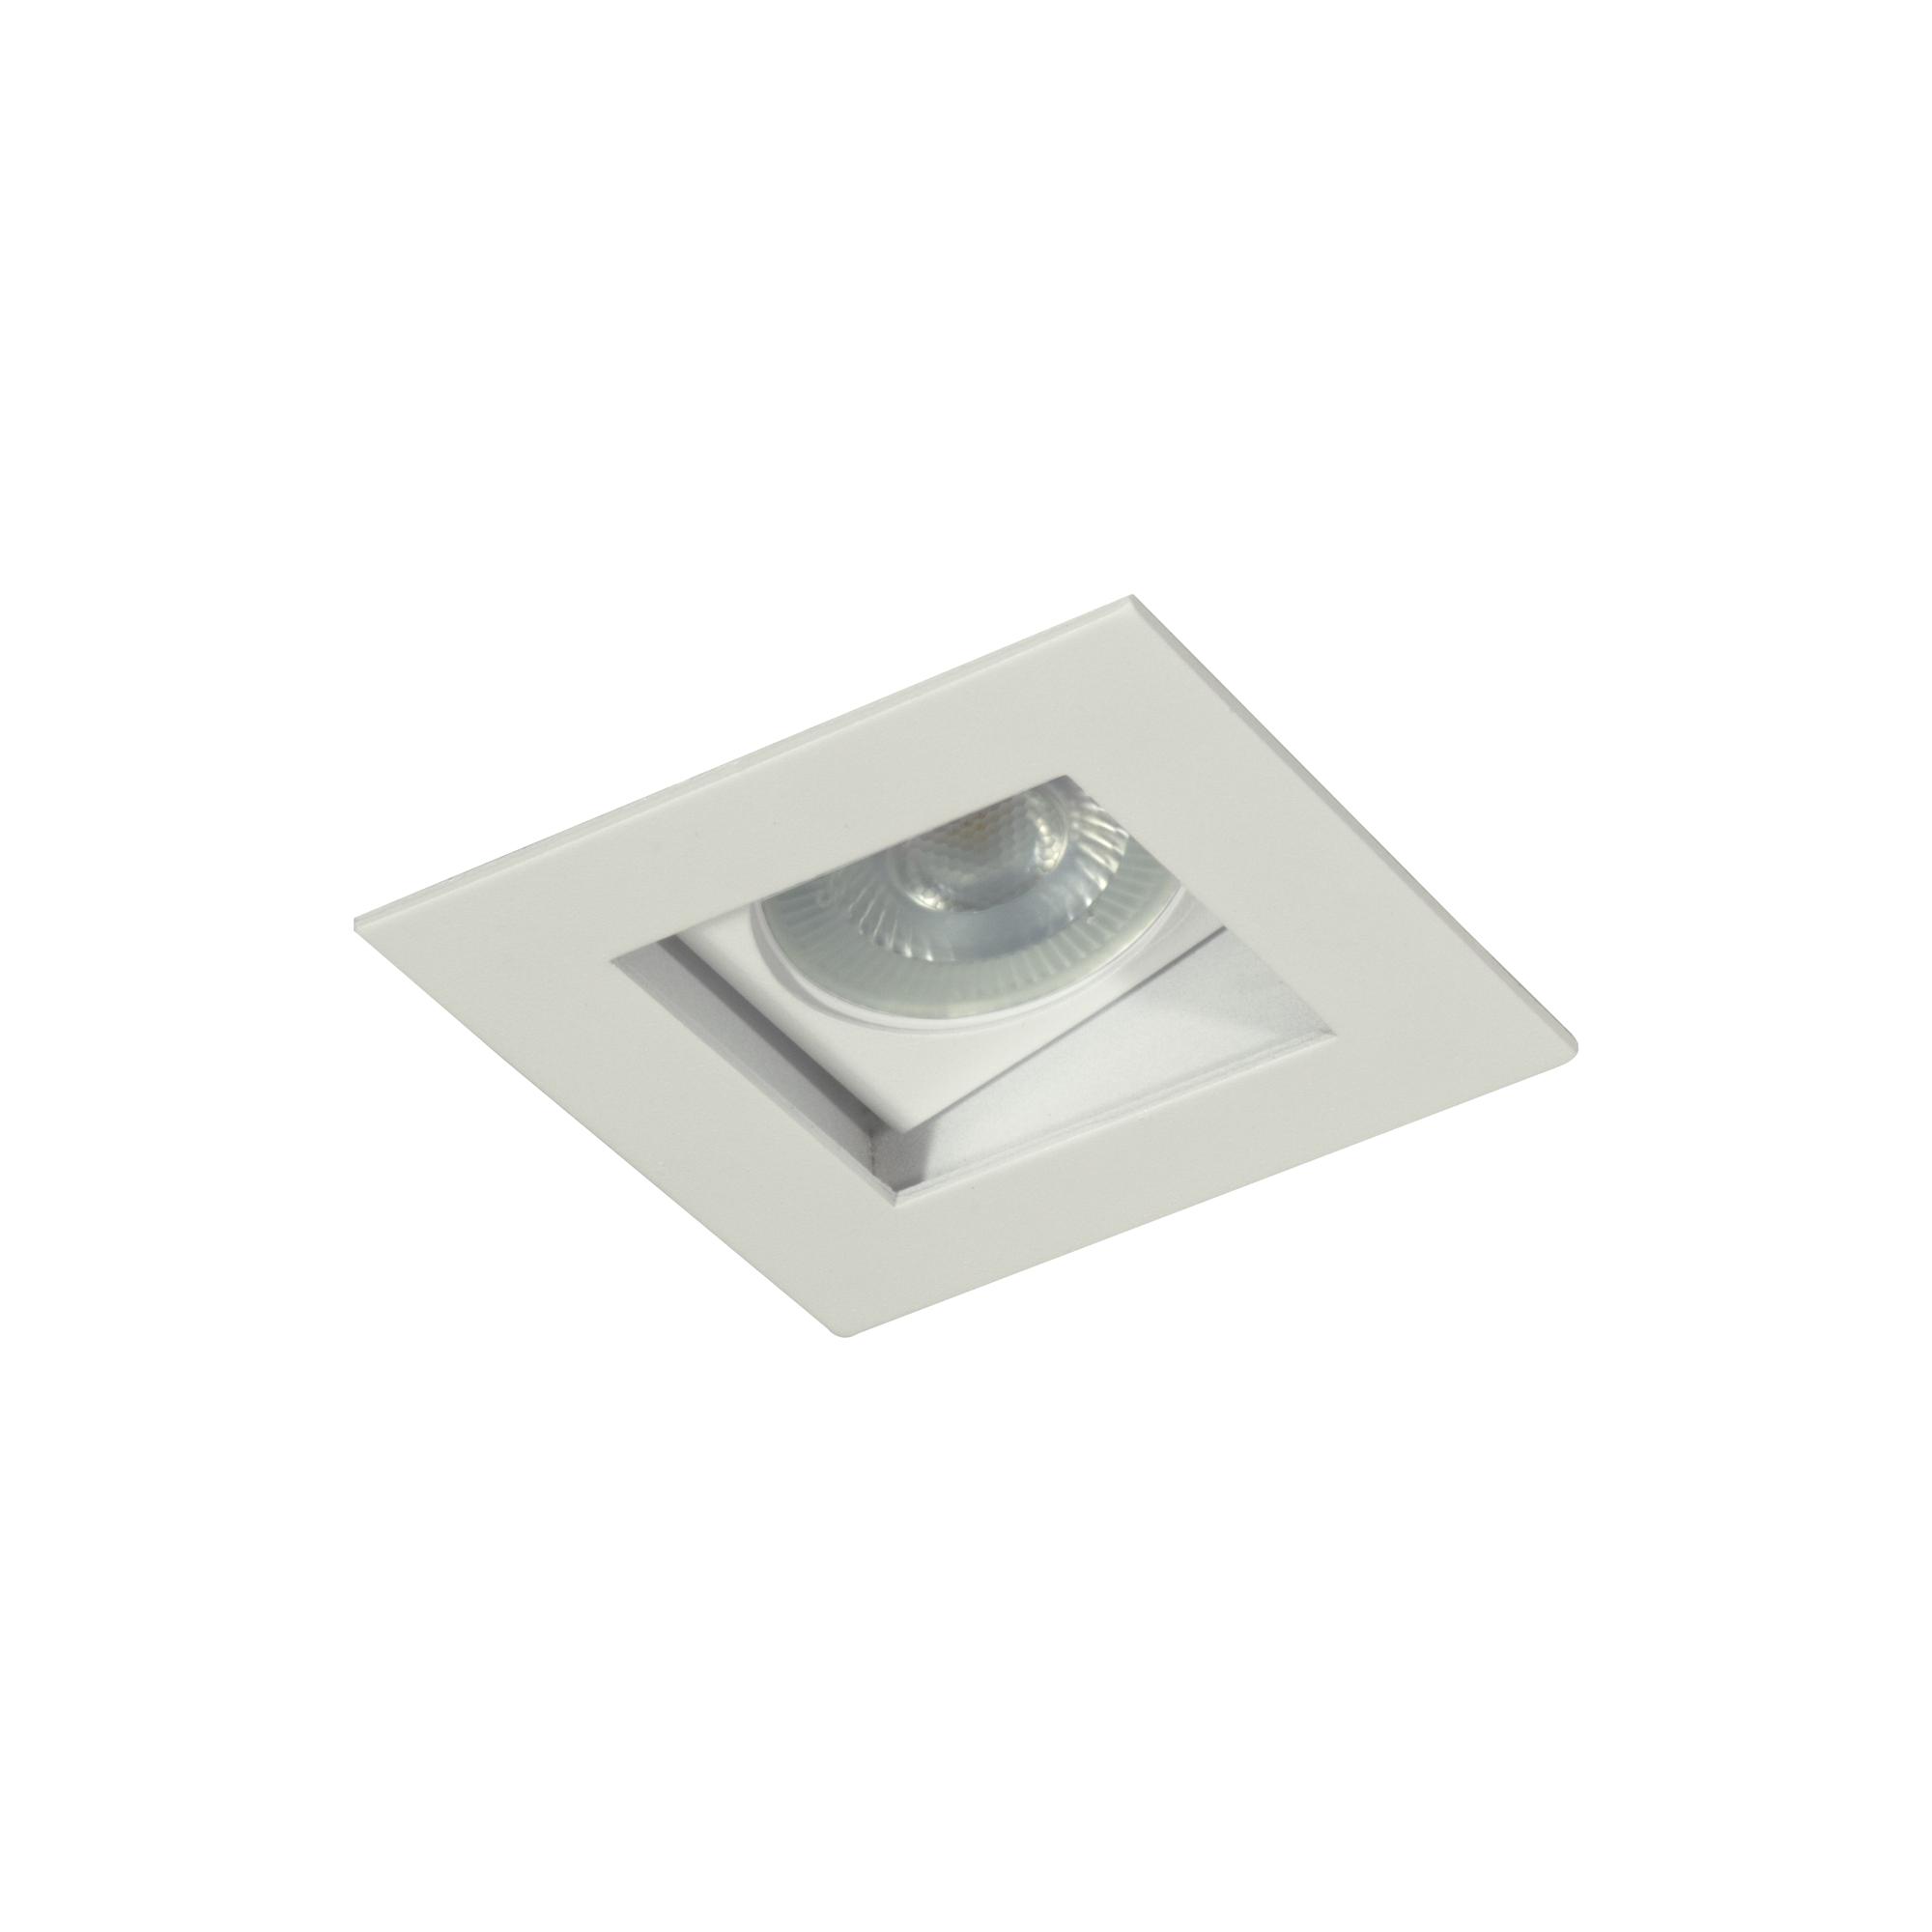 Spot Embutir Aluminio Direcional Quadrado Branco 7002 - Goli